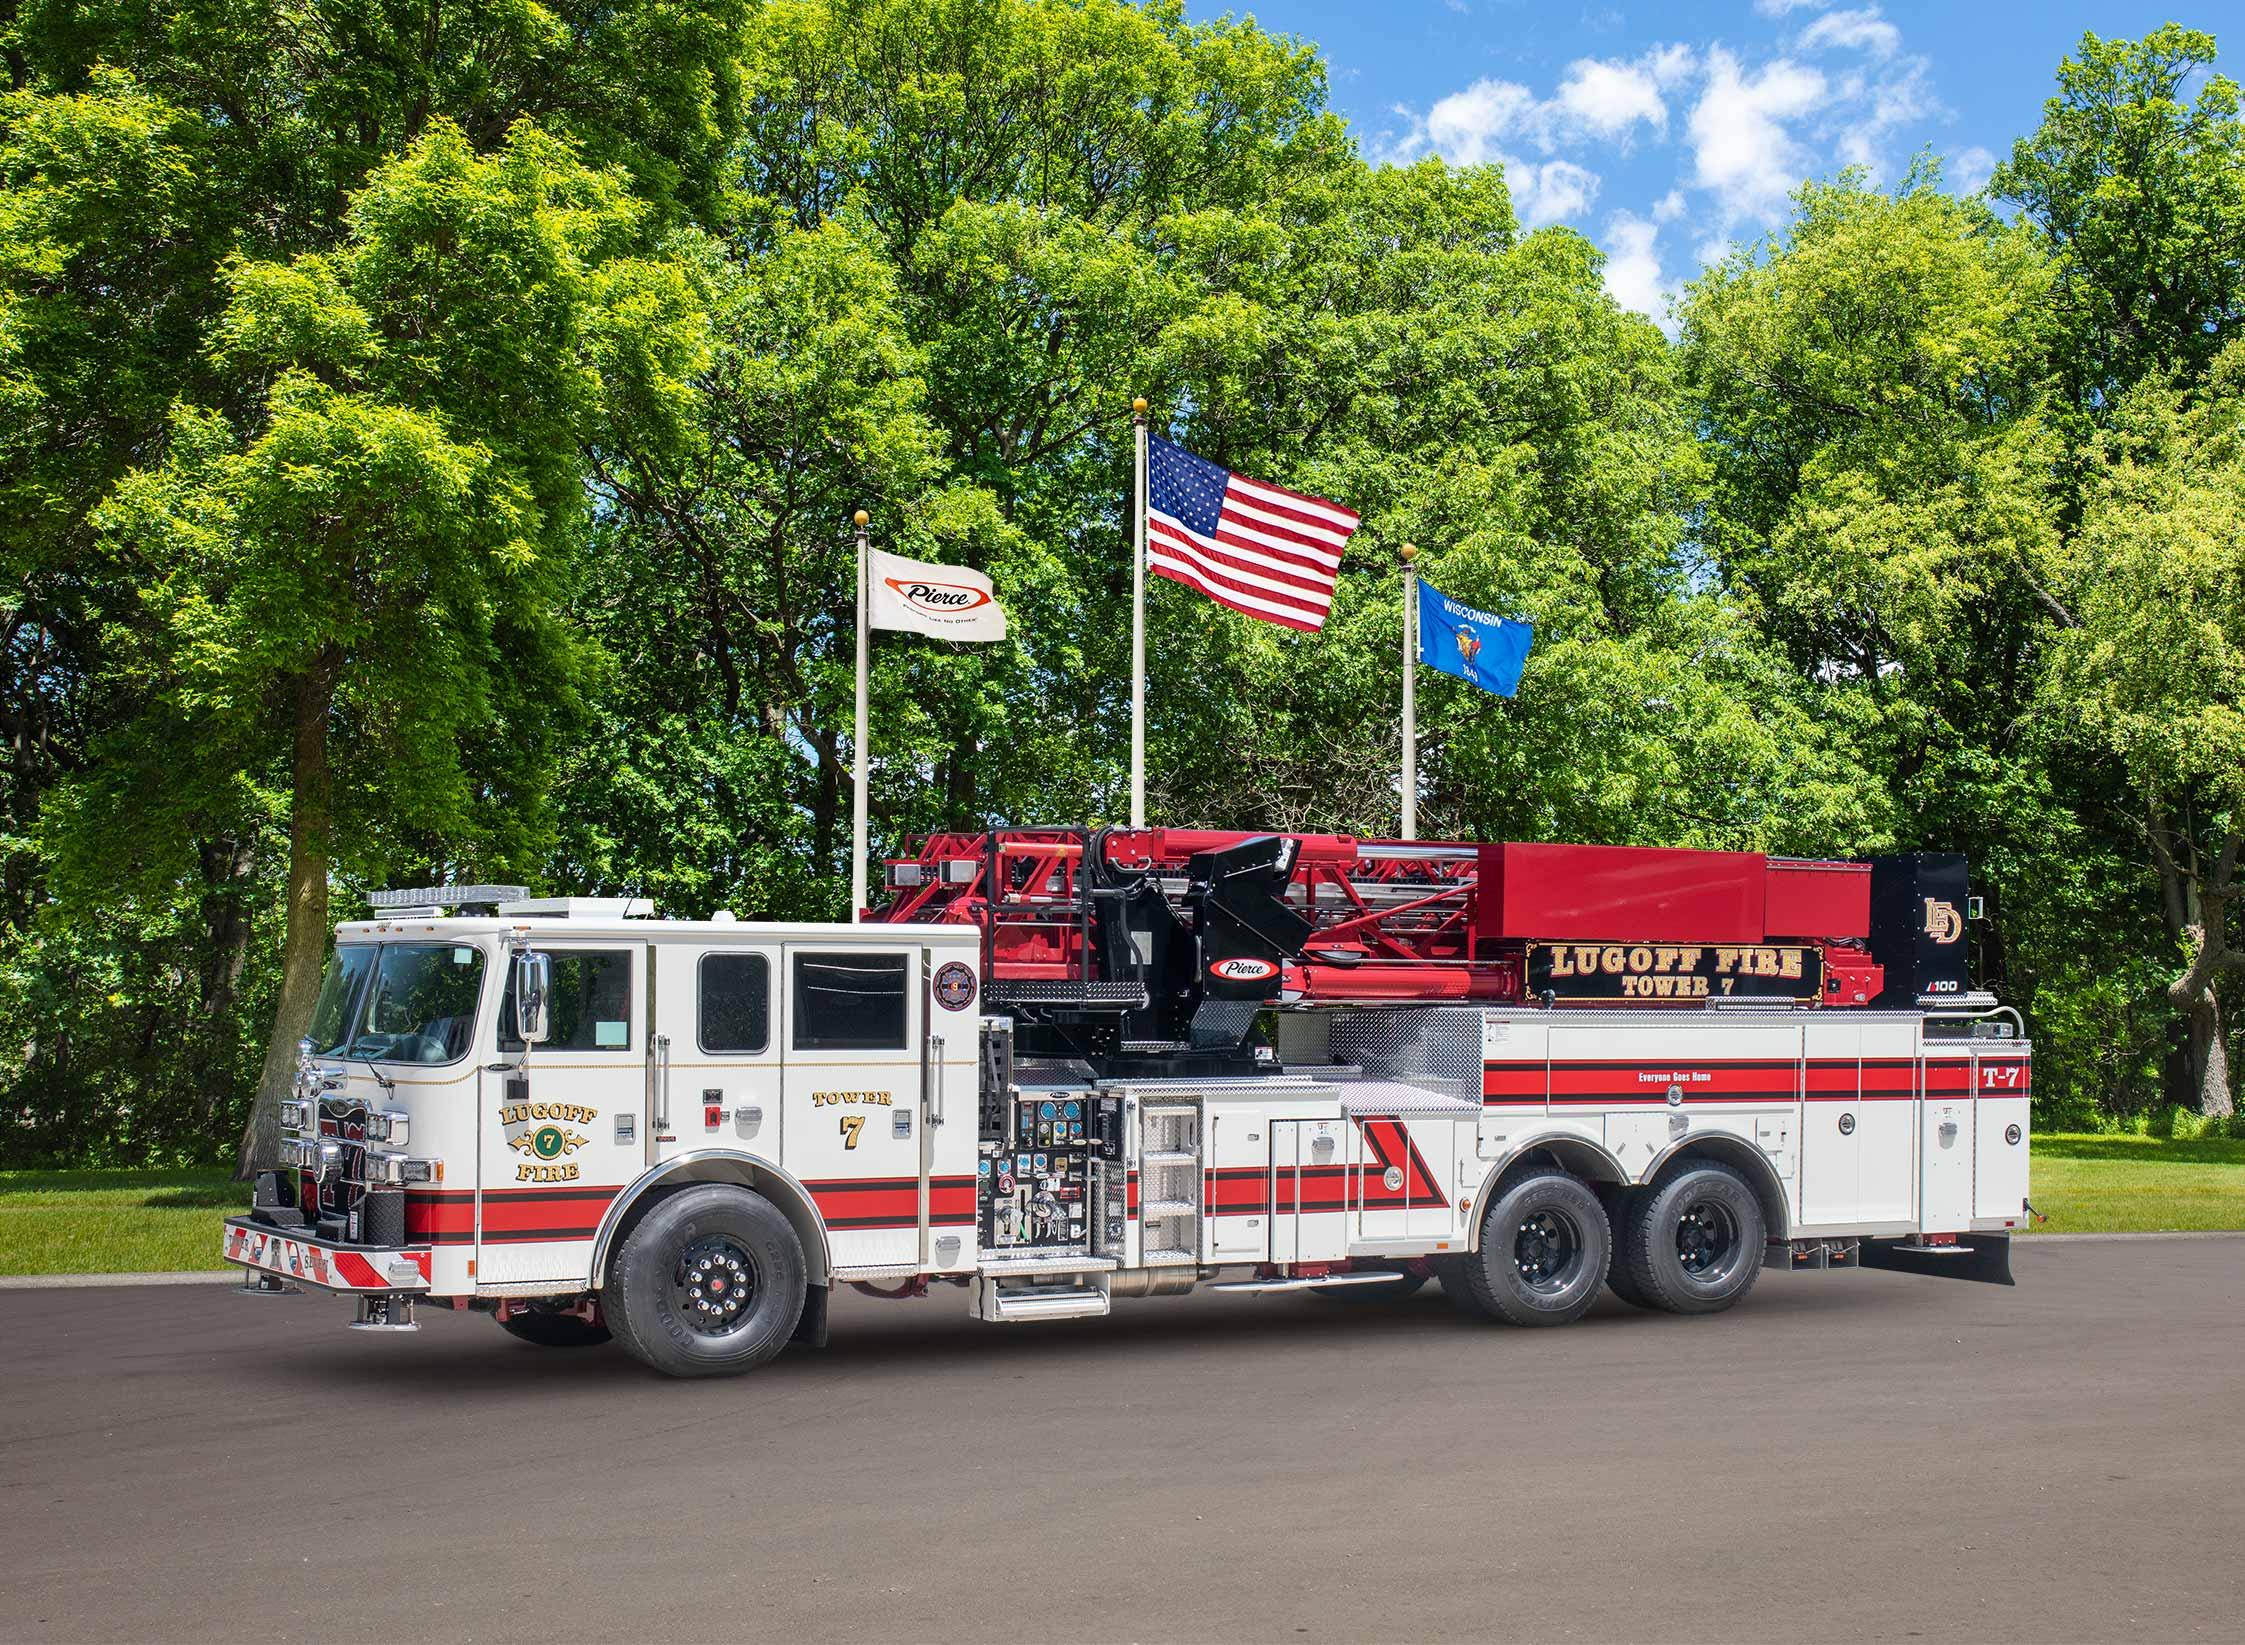 Lugoff Fire Rescue - Aerial